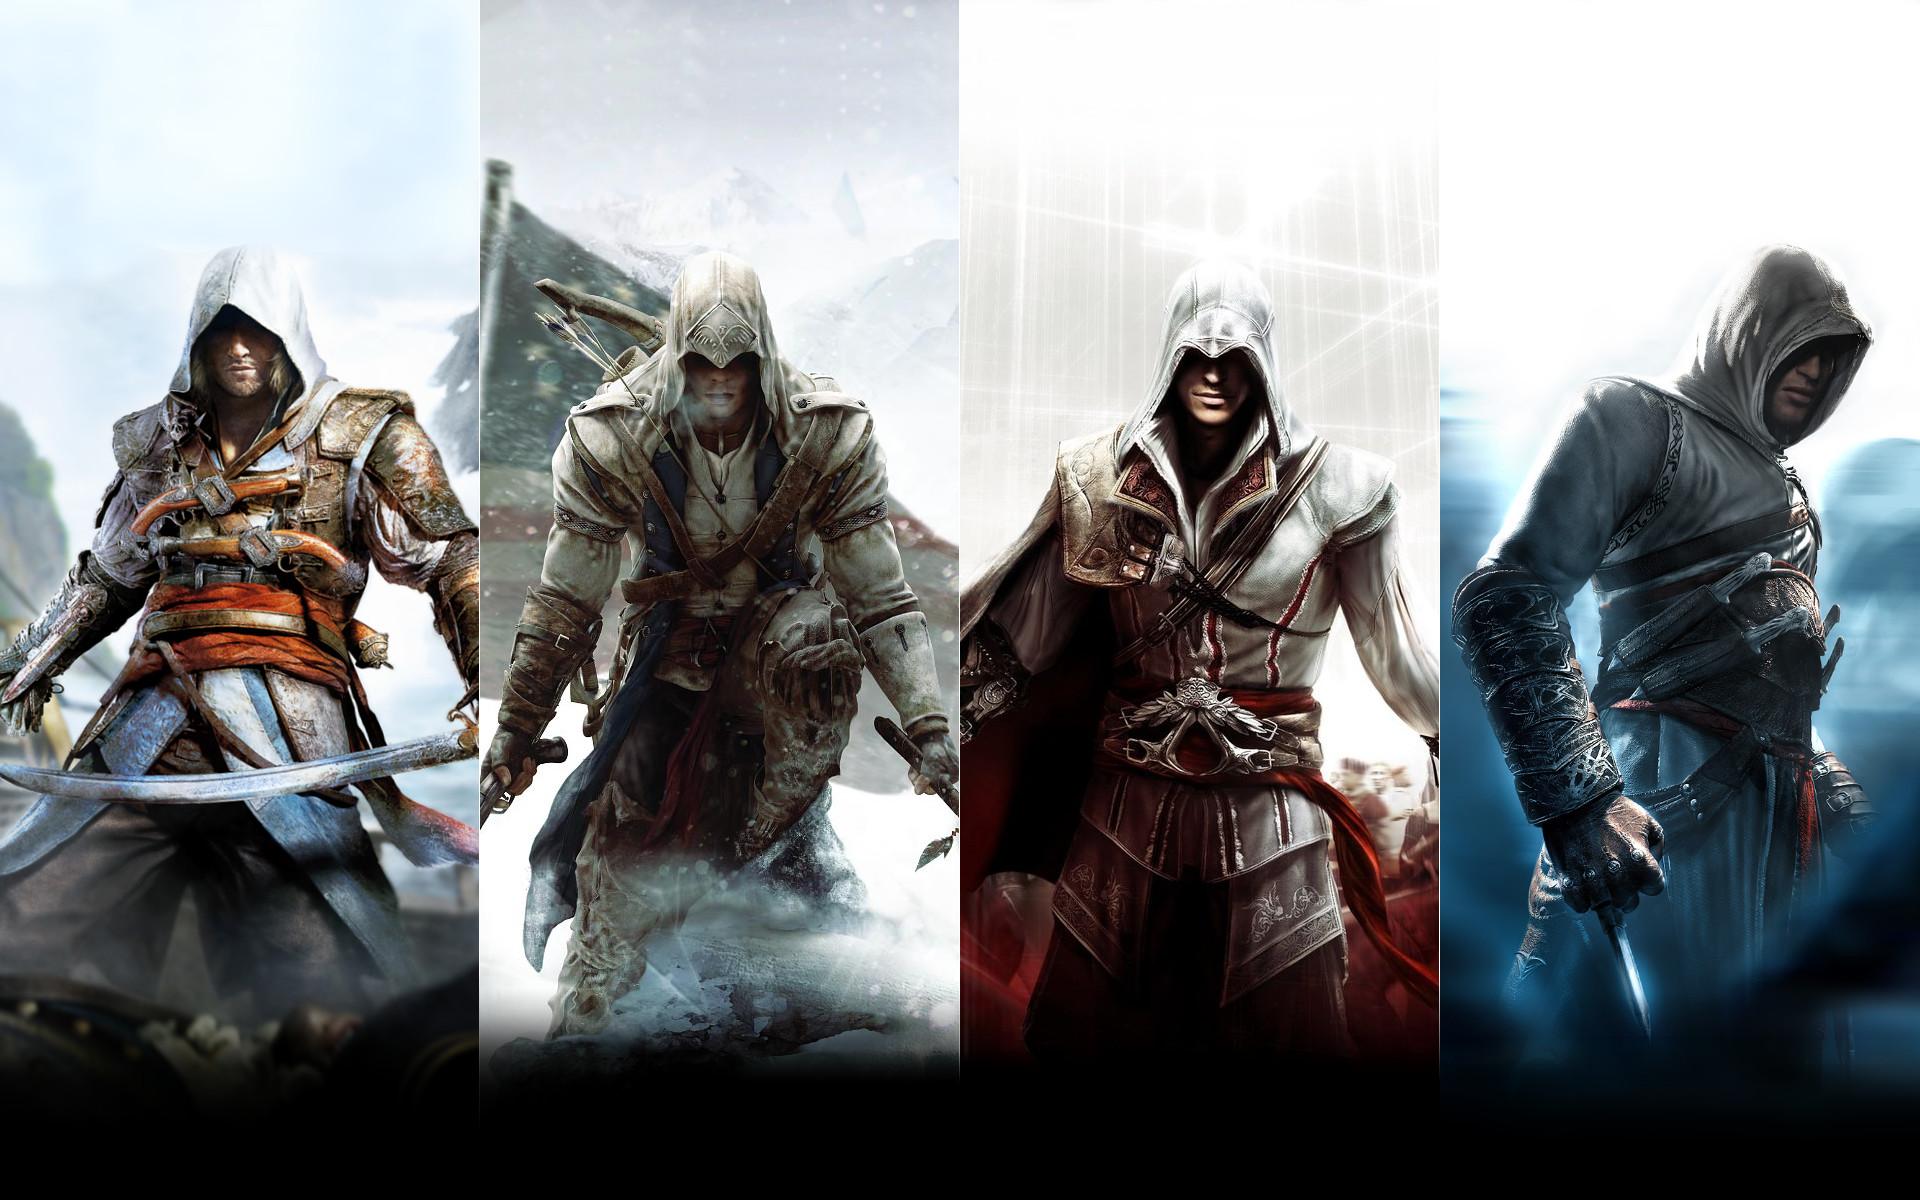 … Assassin's Creed IV – Black Flag HD Wallpaper 1920×1200